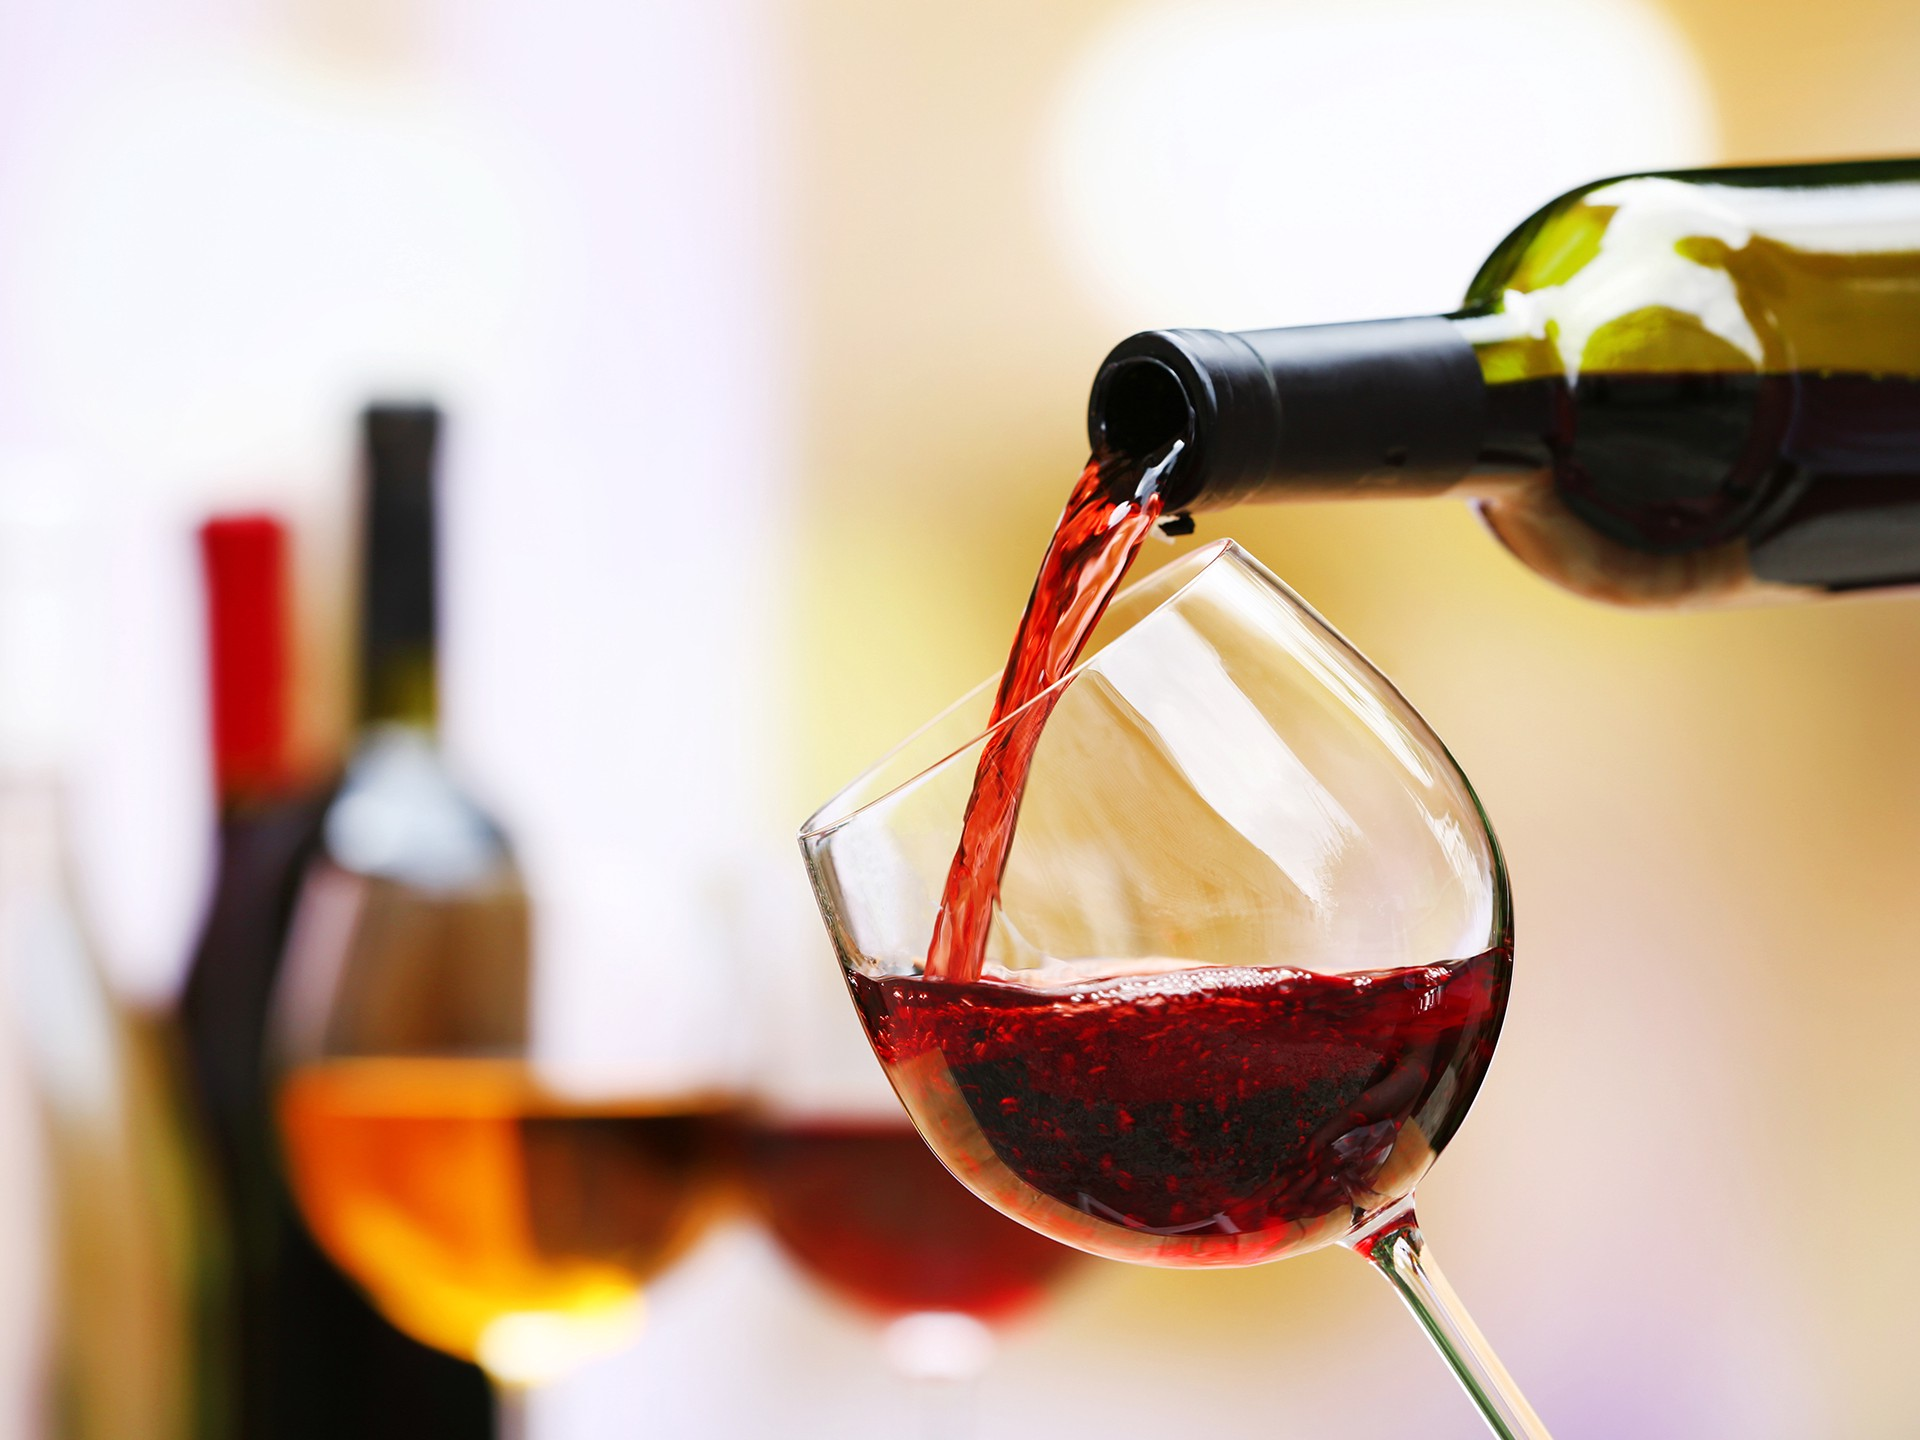 les verres de vin